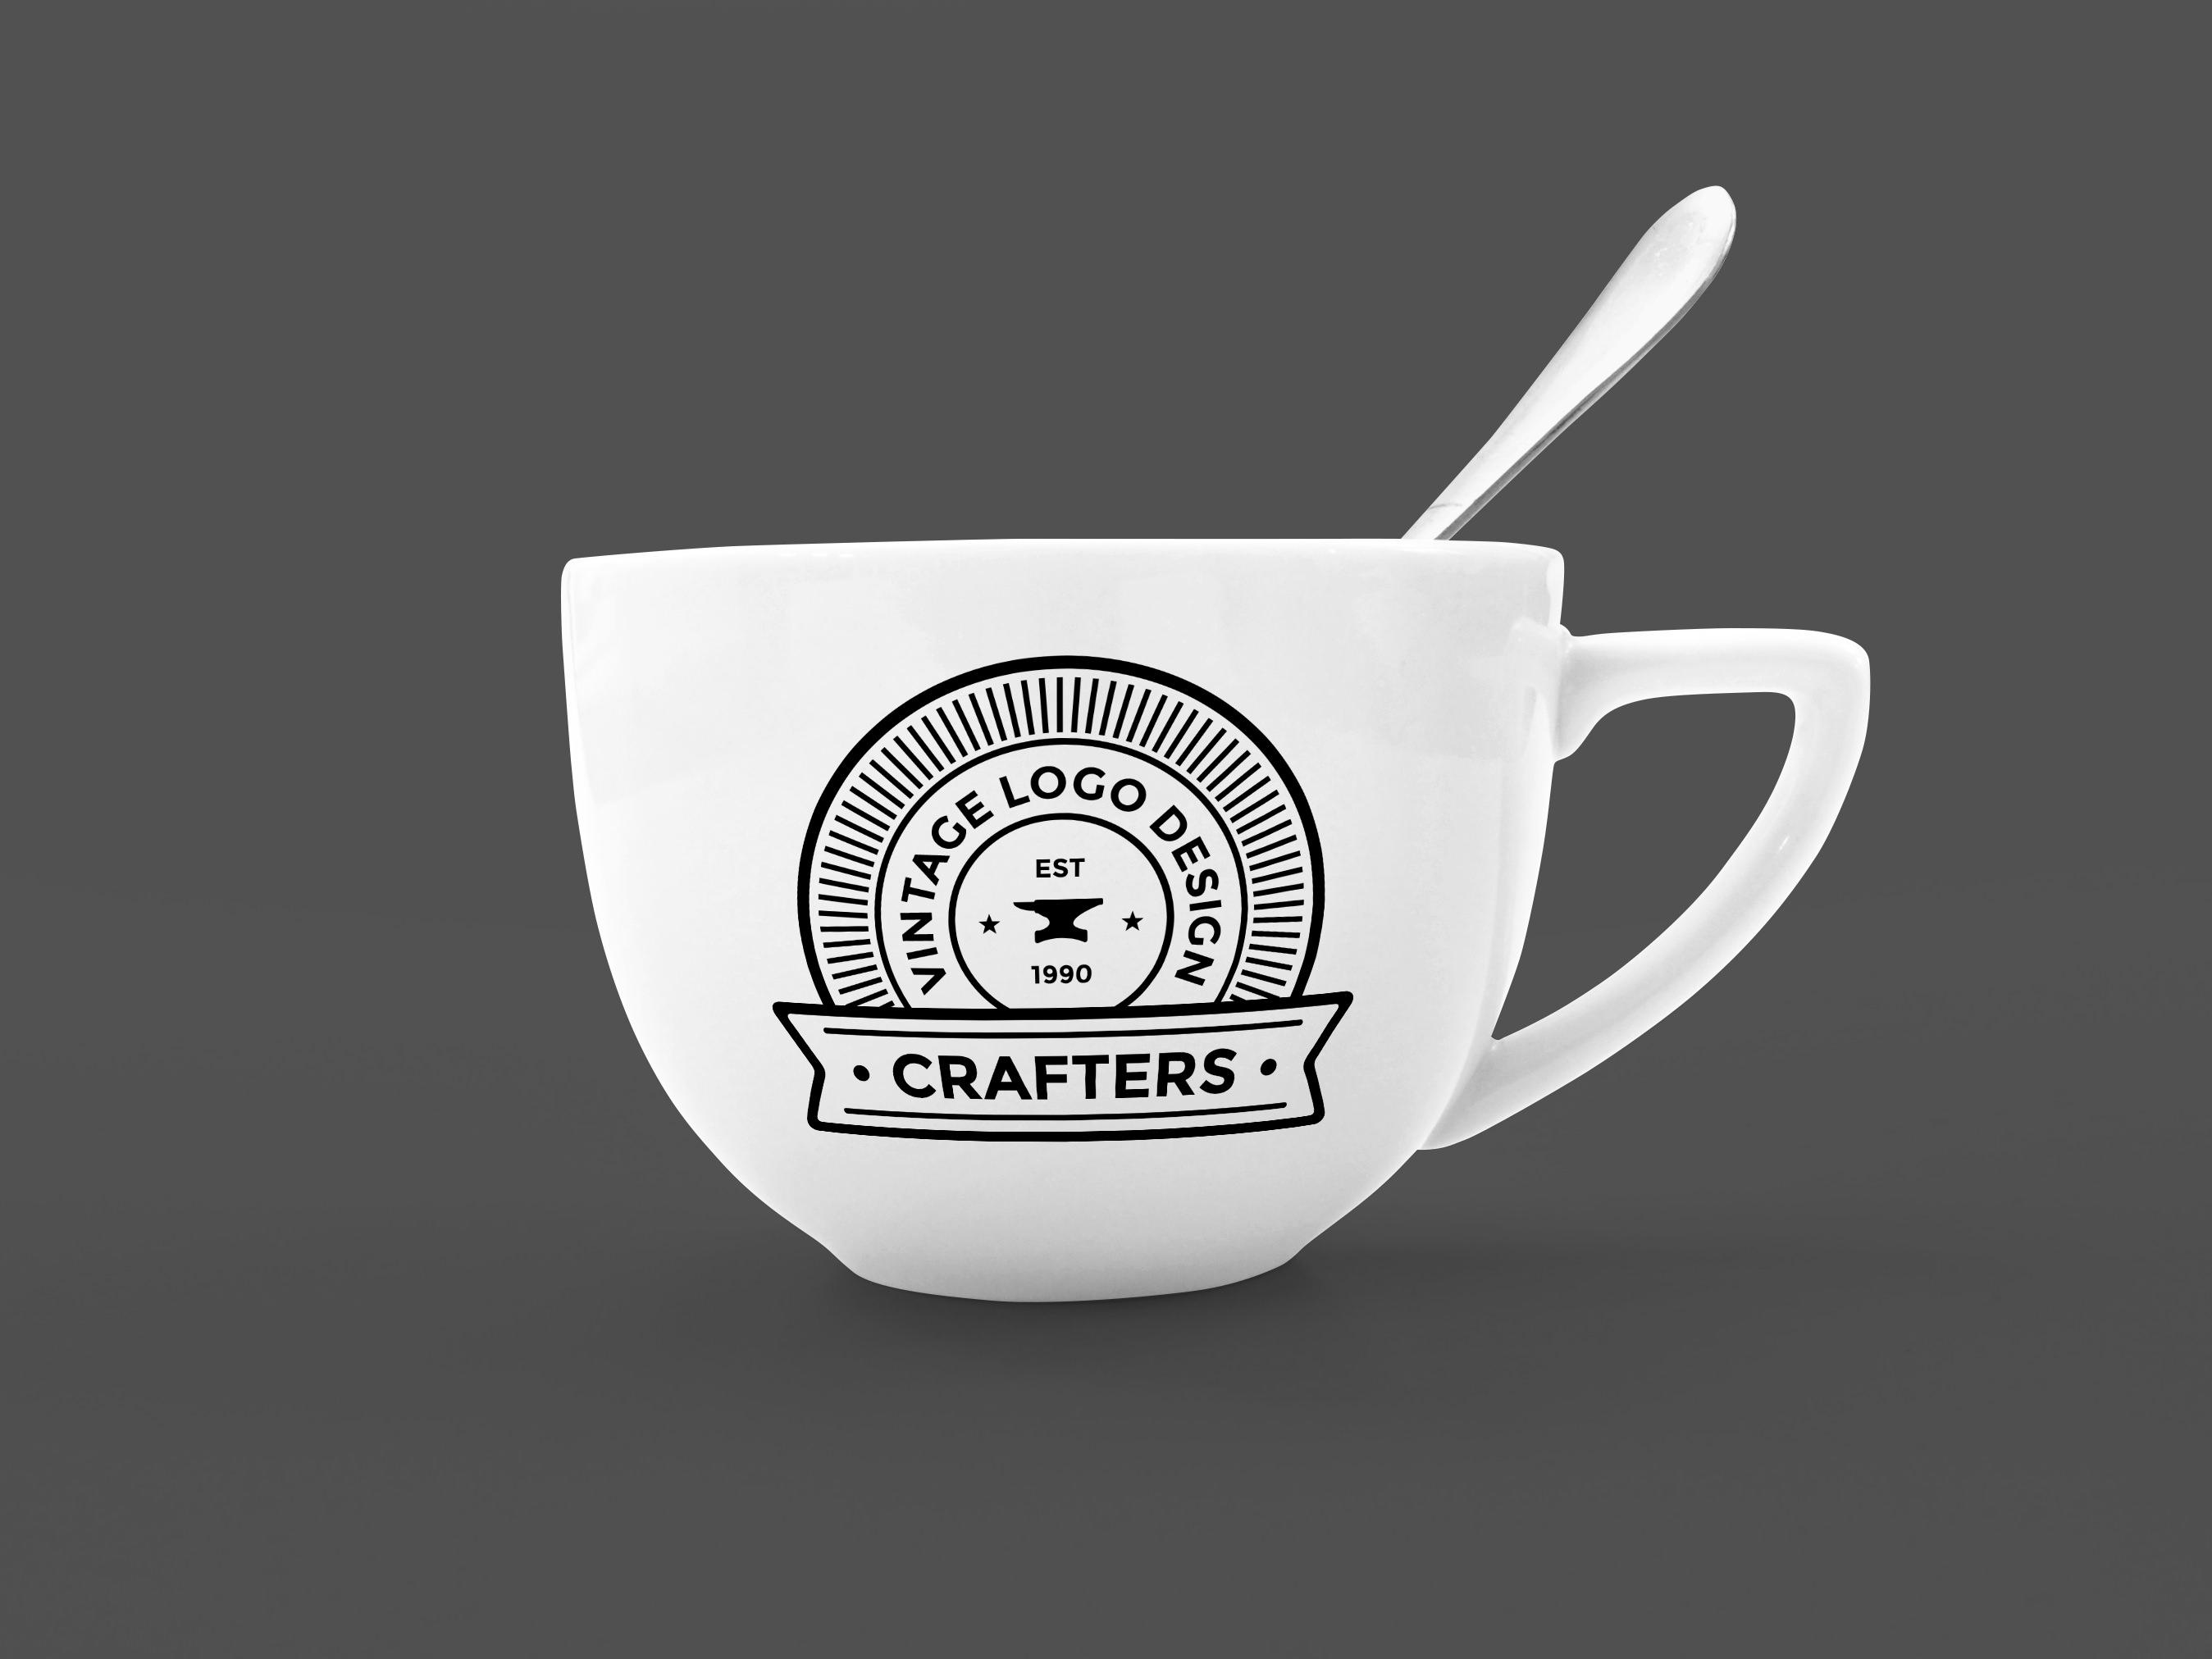 51+ Free PSD Coffee Cup Mockups | FreeCreatives